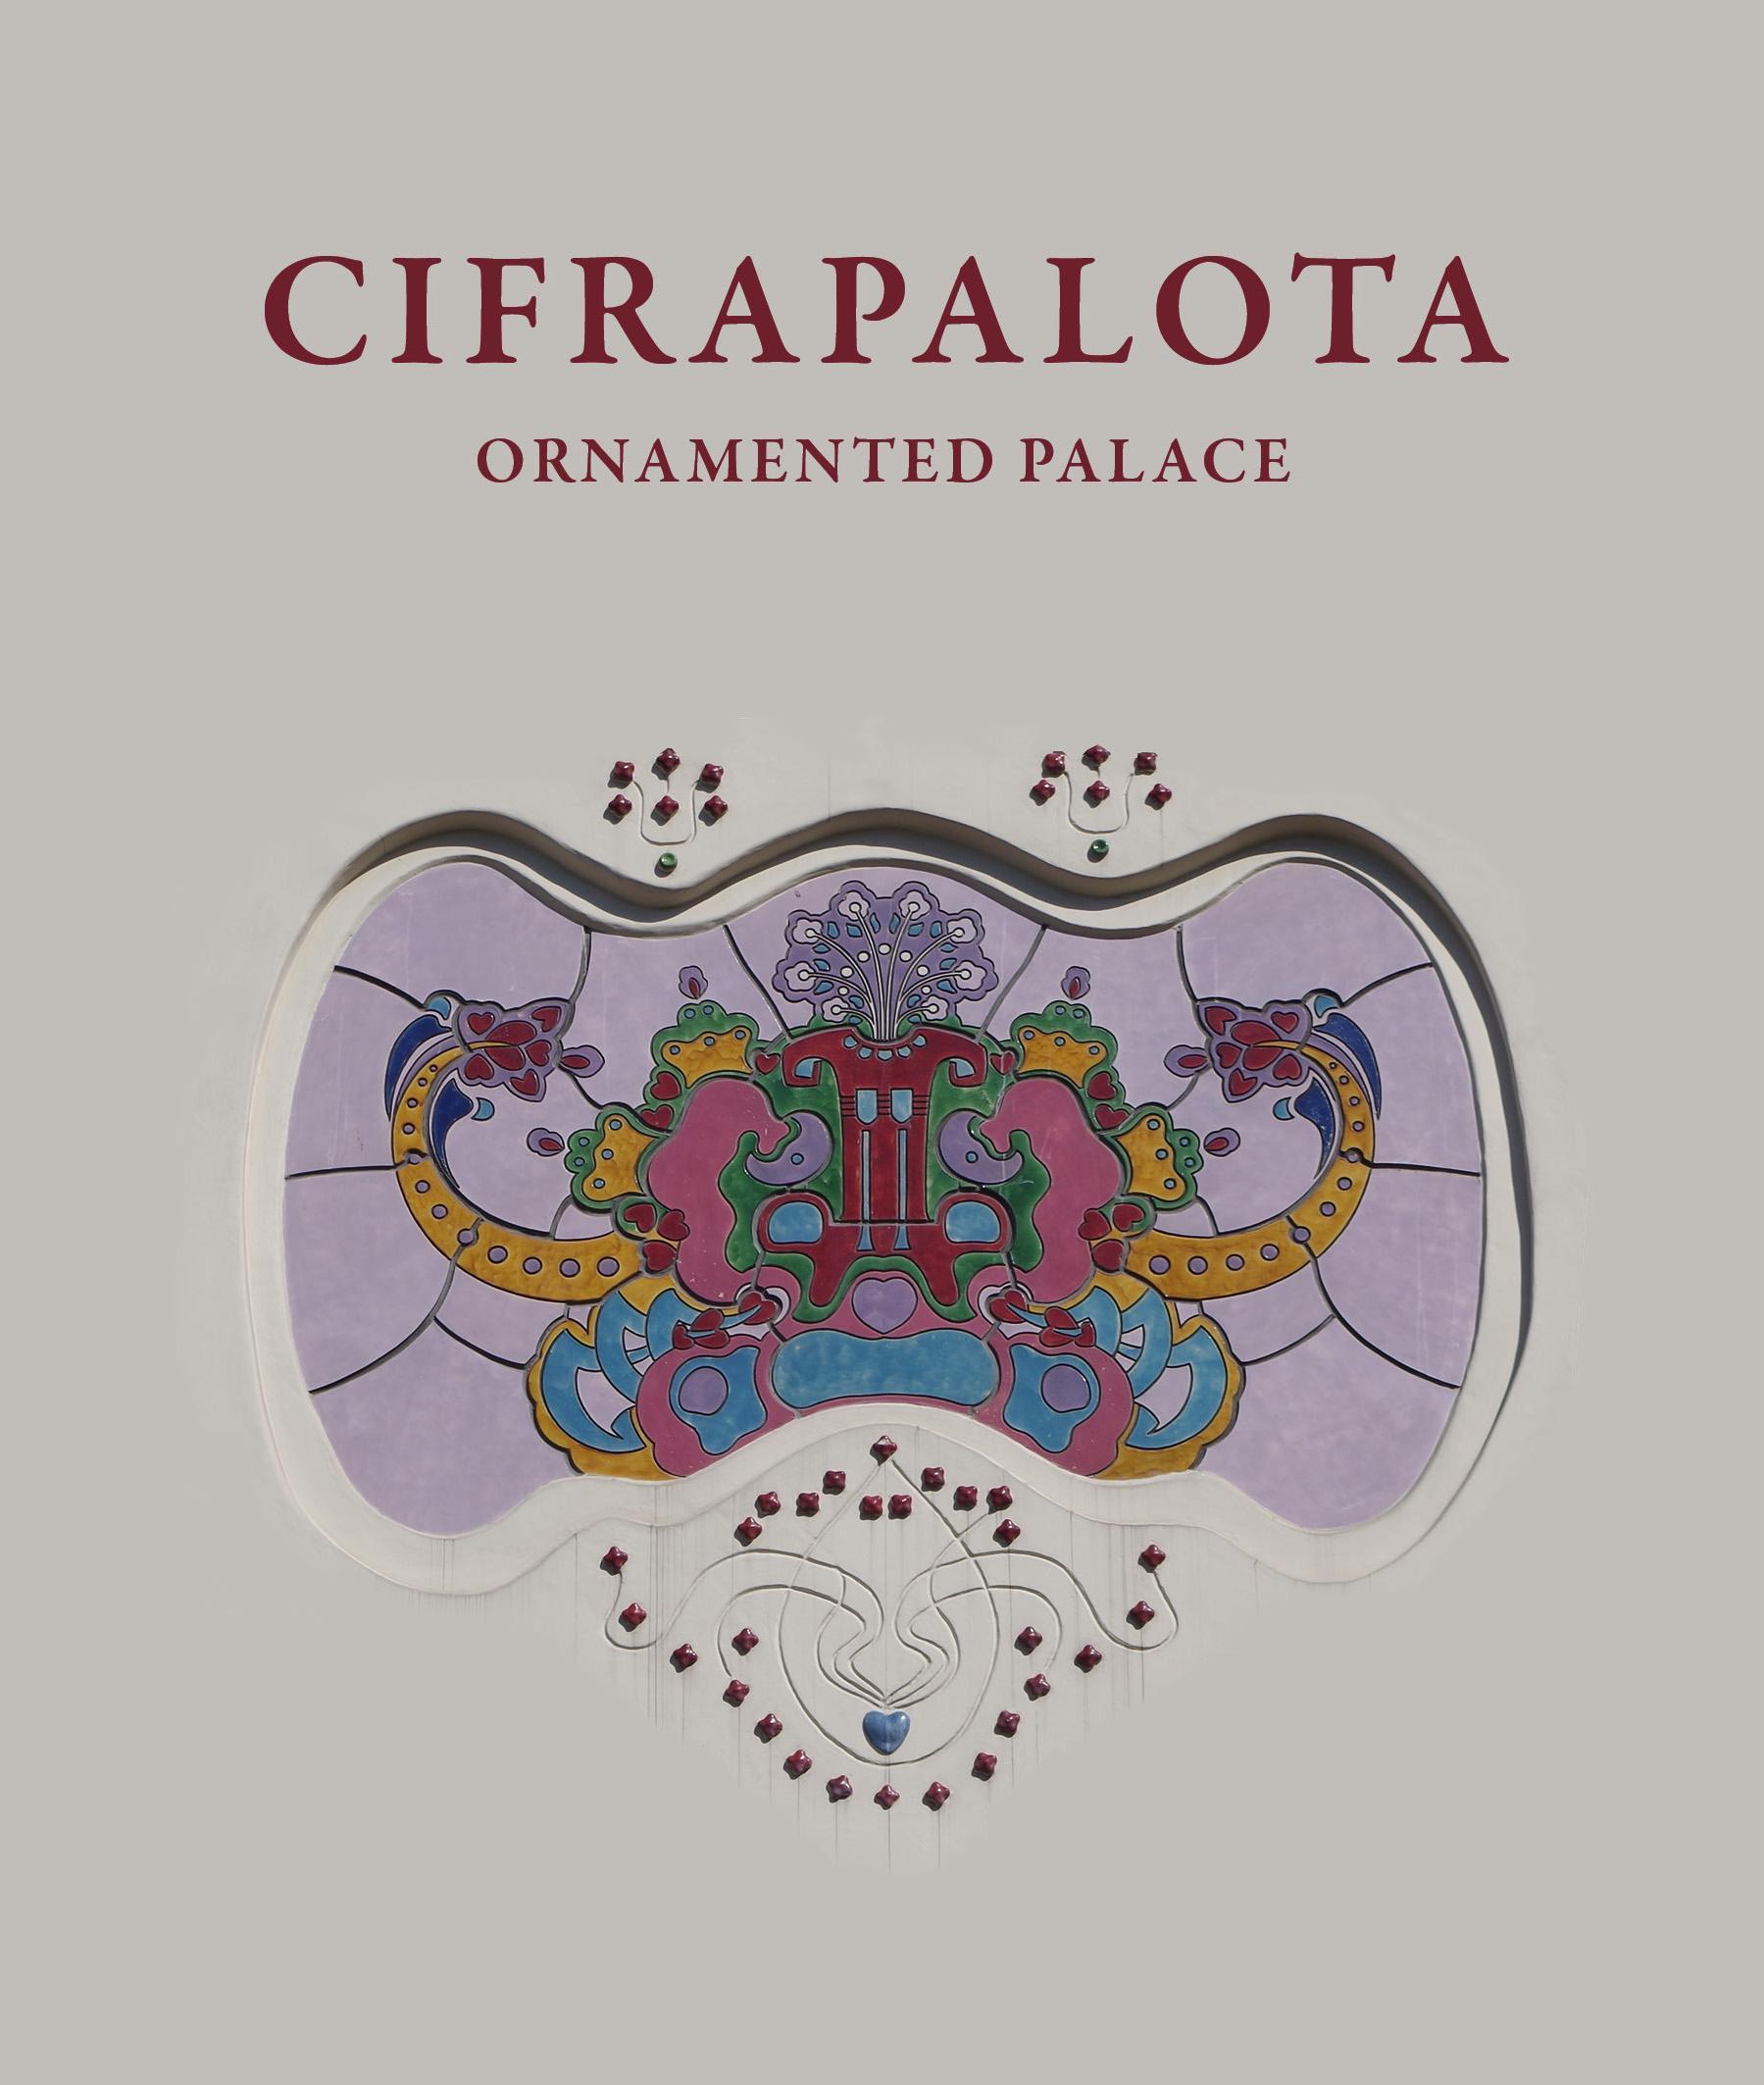 CIFRAPALOTA - ORNAMENTED PALACE